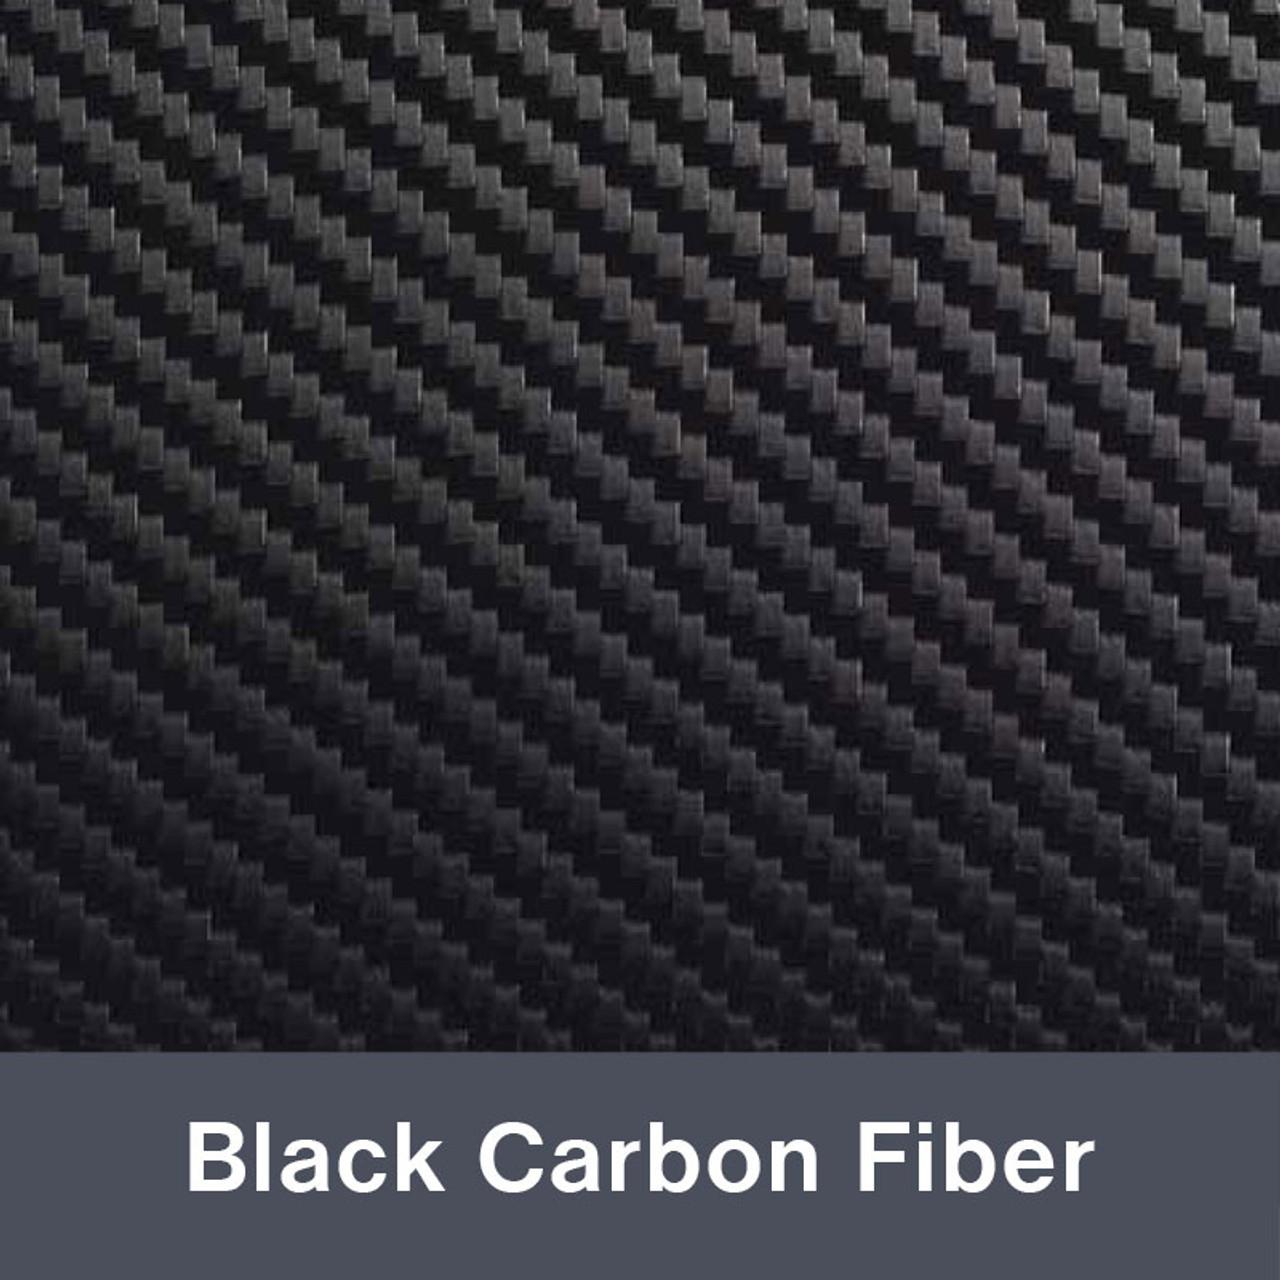 Iron-on Black Carbon Fiber 4225